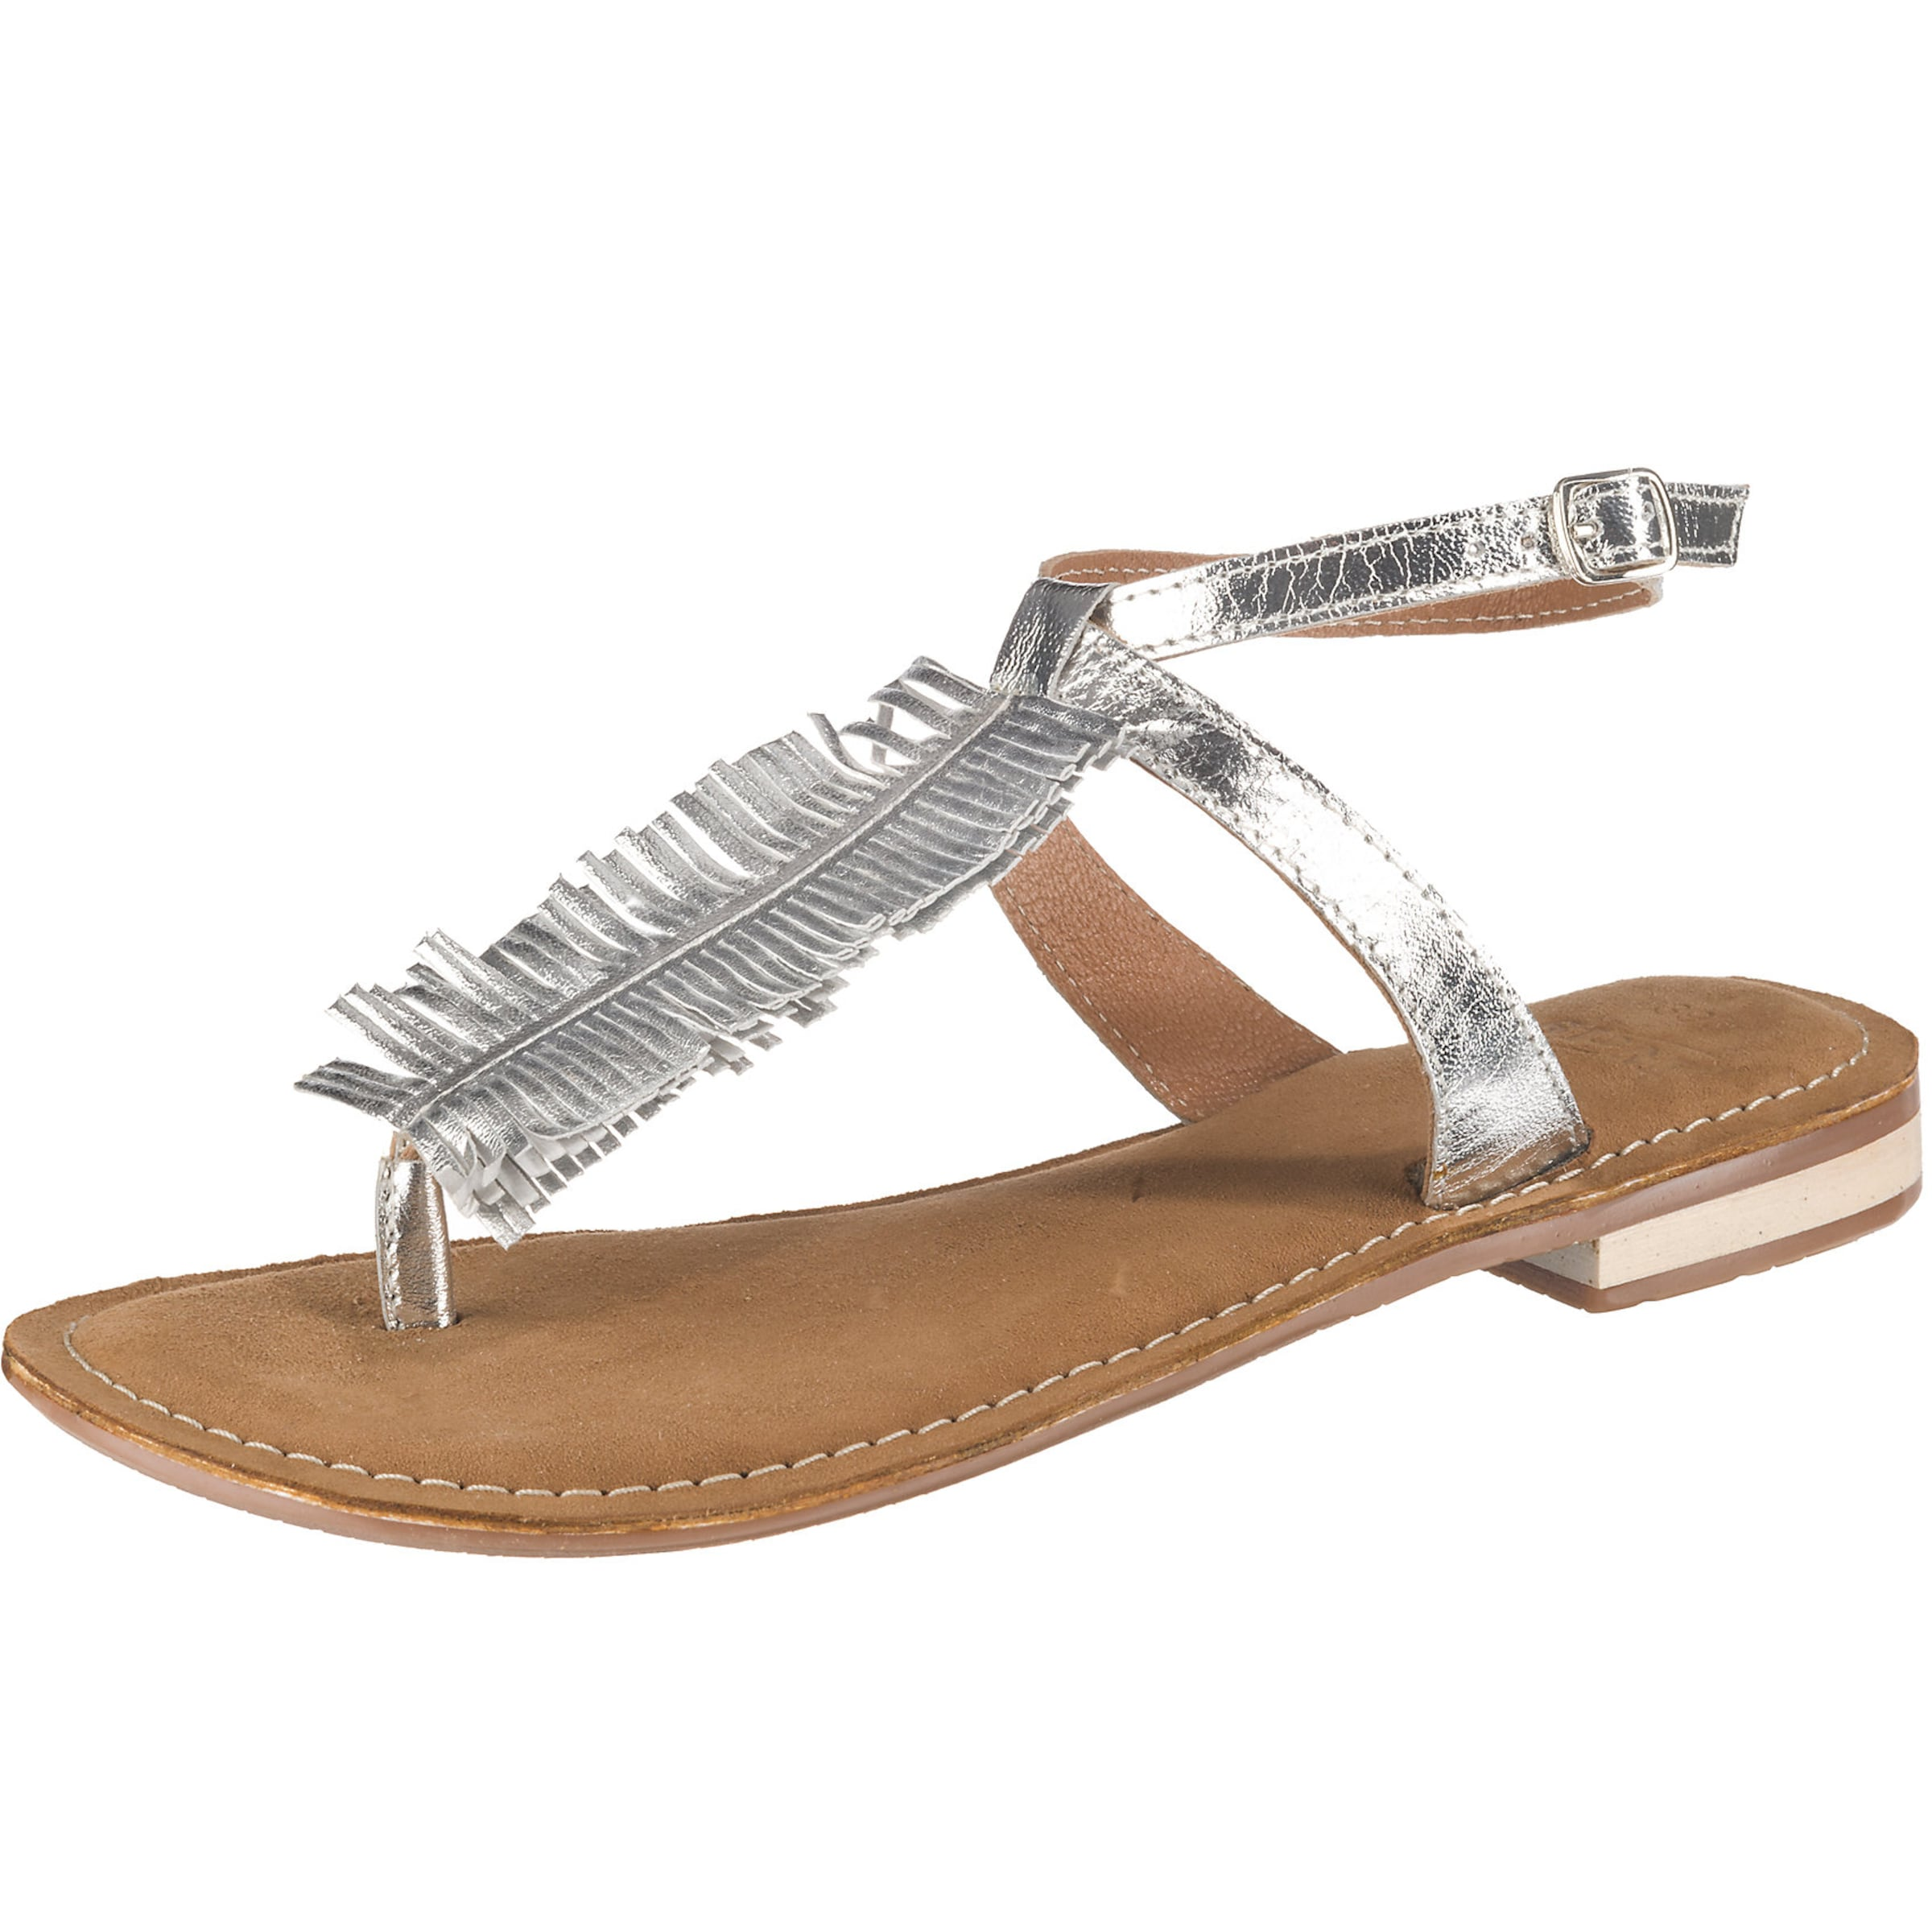 'dorian' Silber Silber In In Spm Sandalen Spm 'dorian' Sandalen N8wvm0nyPO